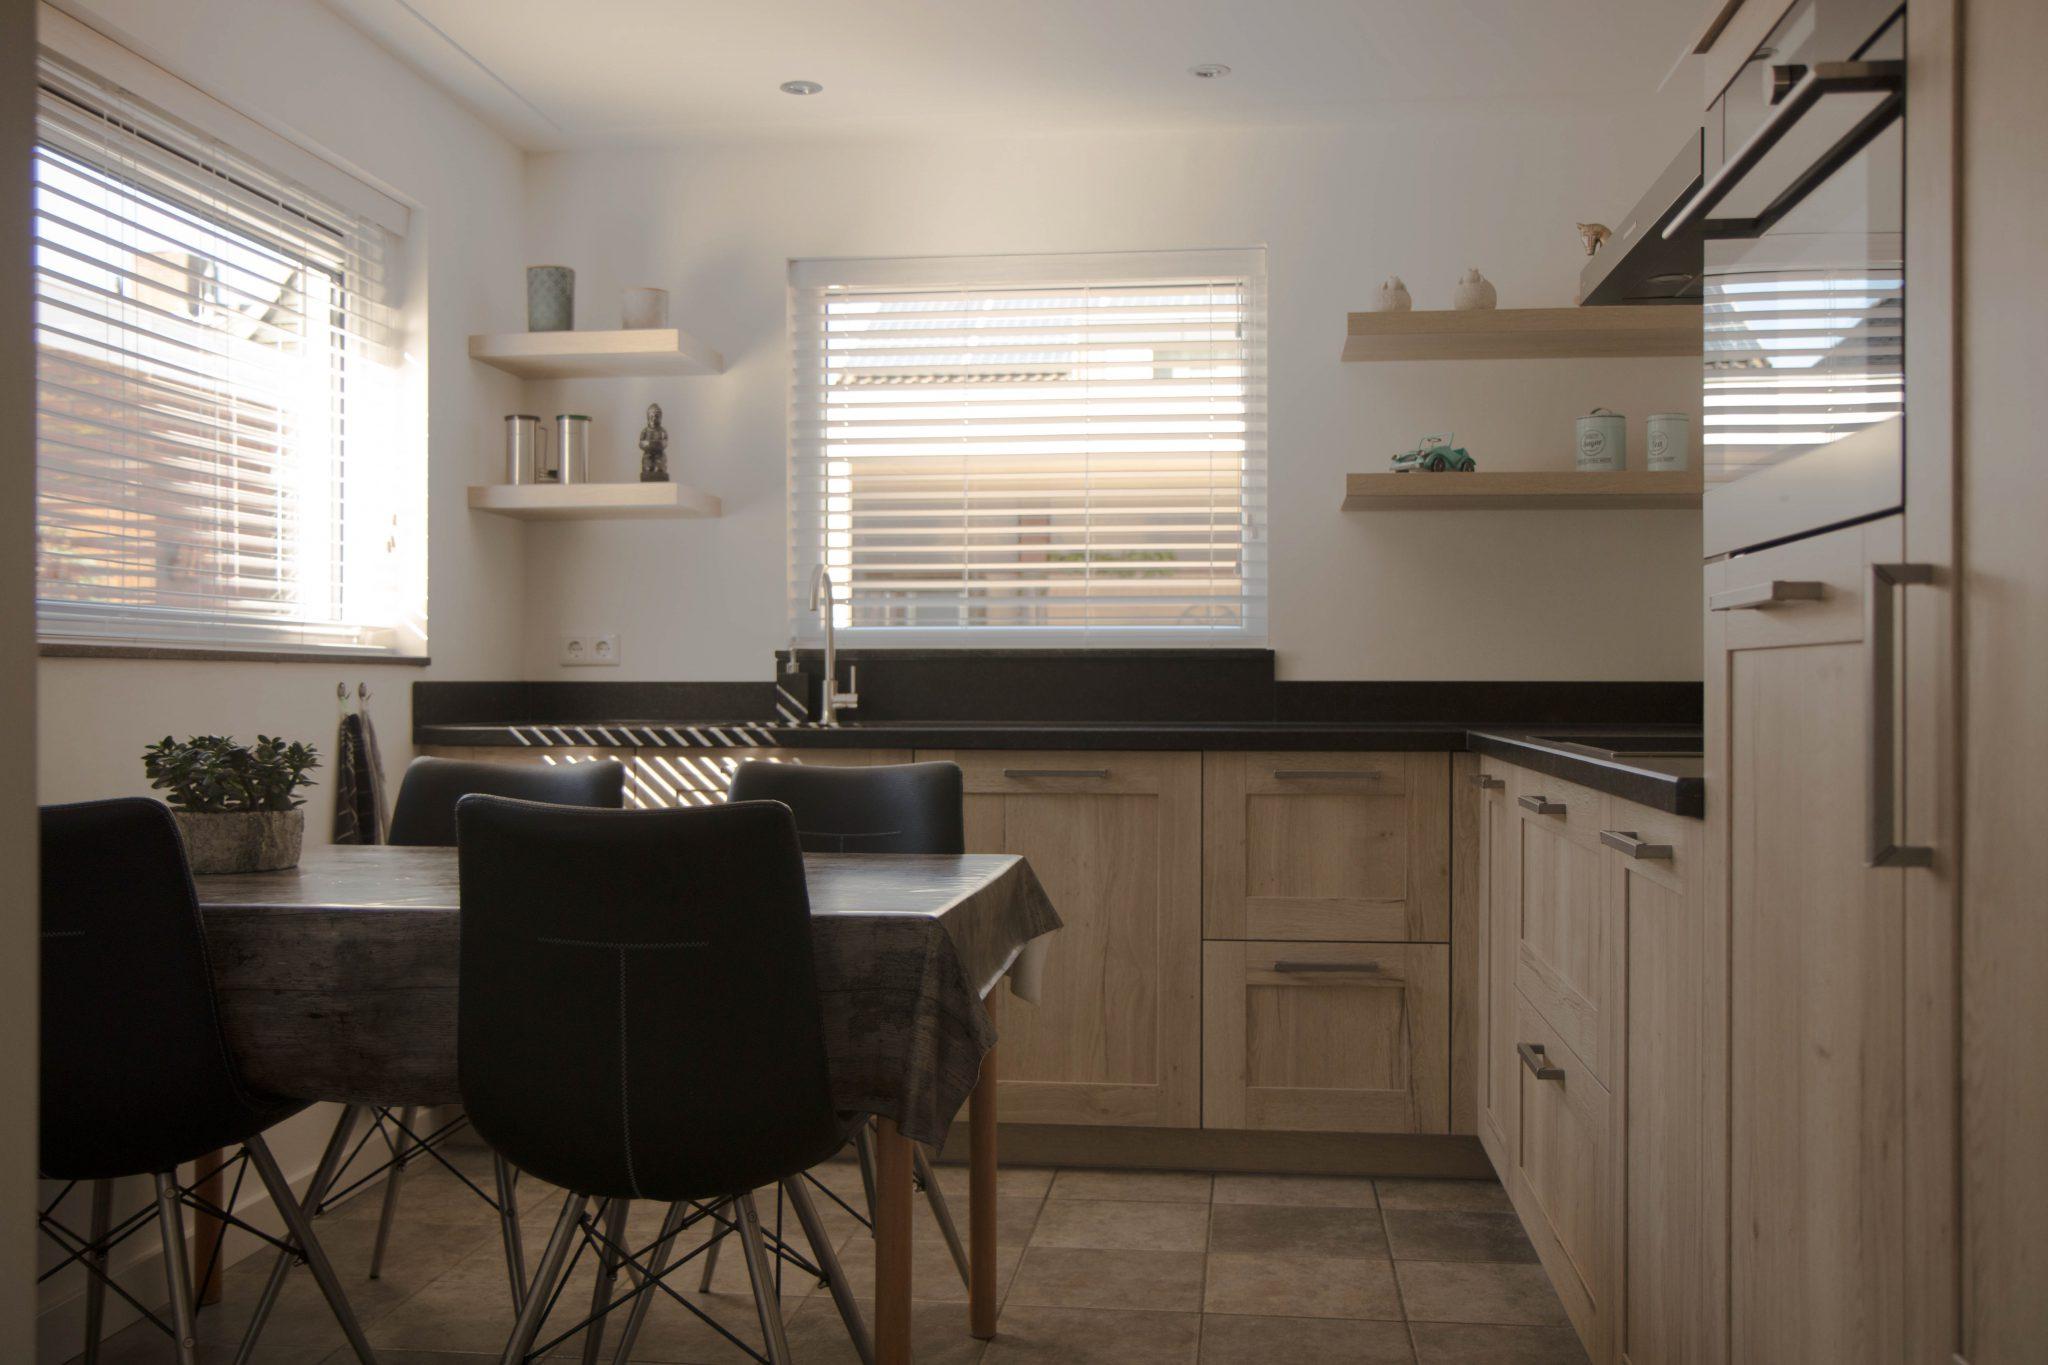 Keukens de houtwinkel bladel